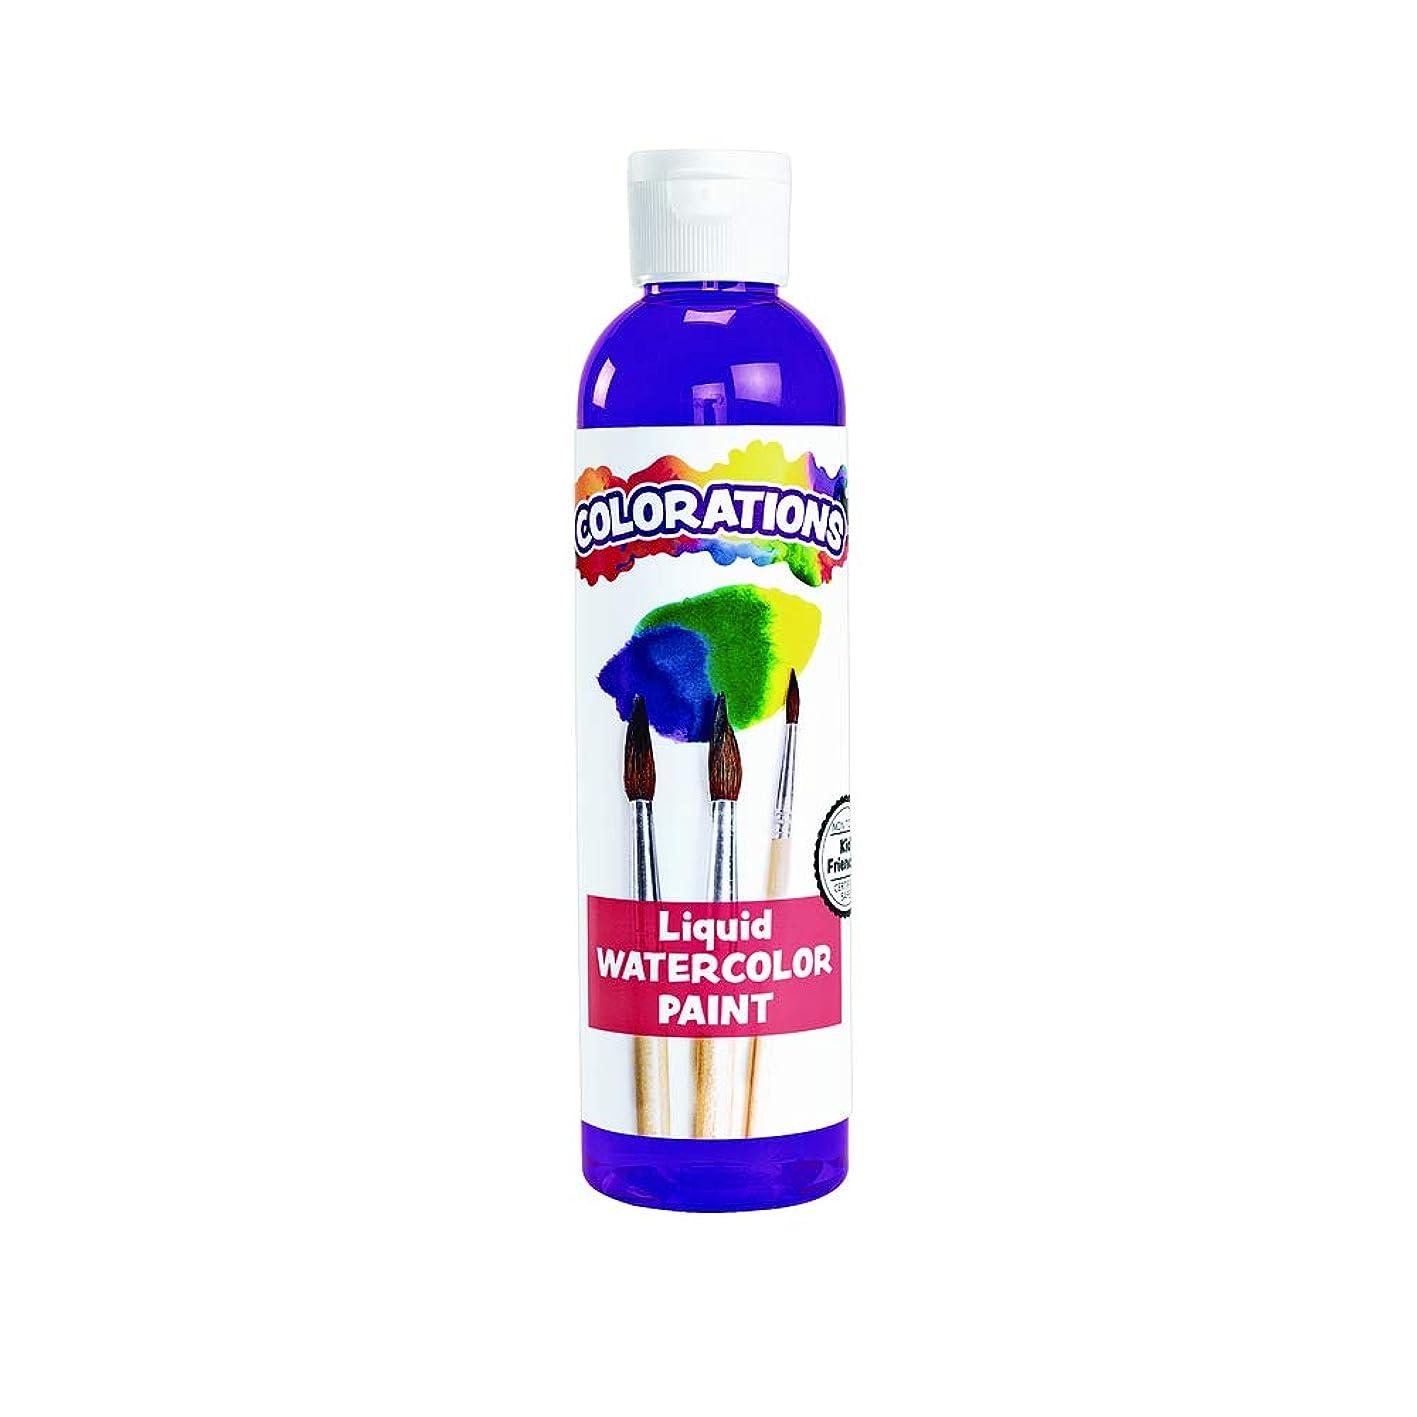 Colorations LWPR Liquid Watercolor Paint, Purple - 8 oz. oiuztvqbumd359